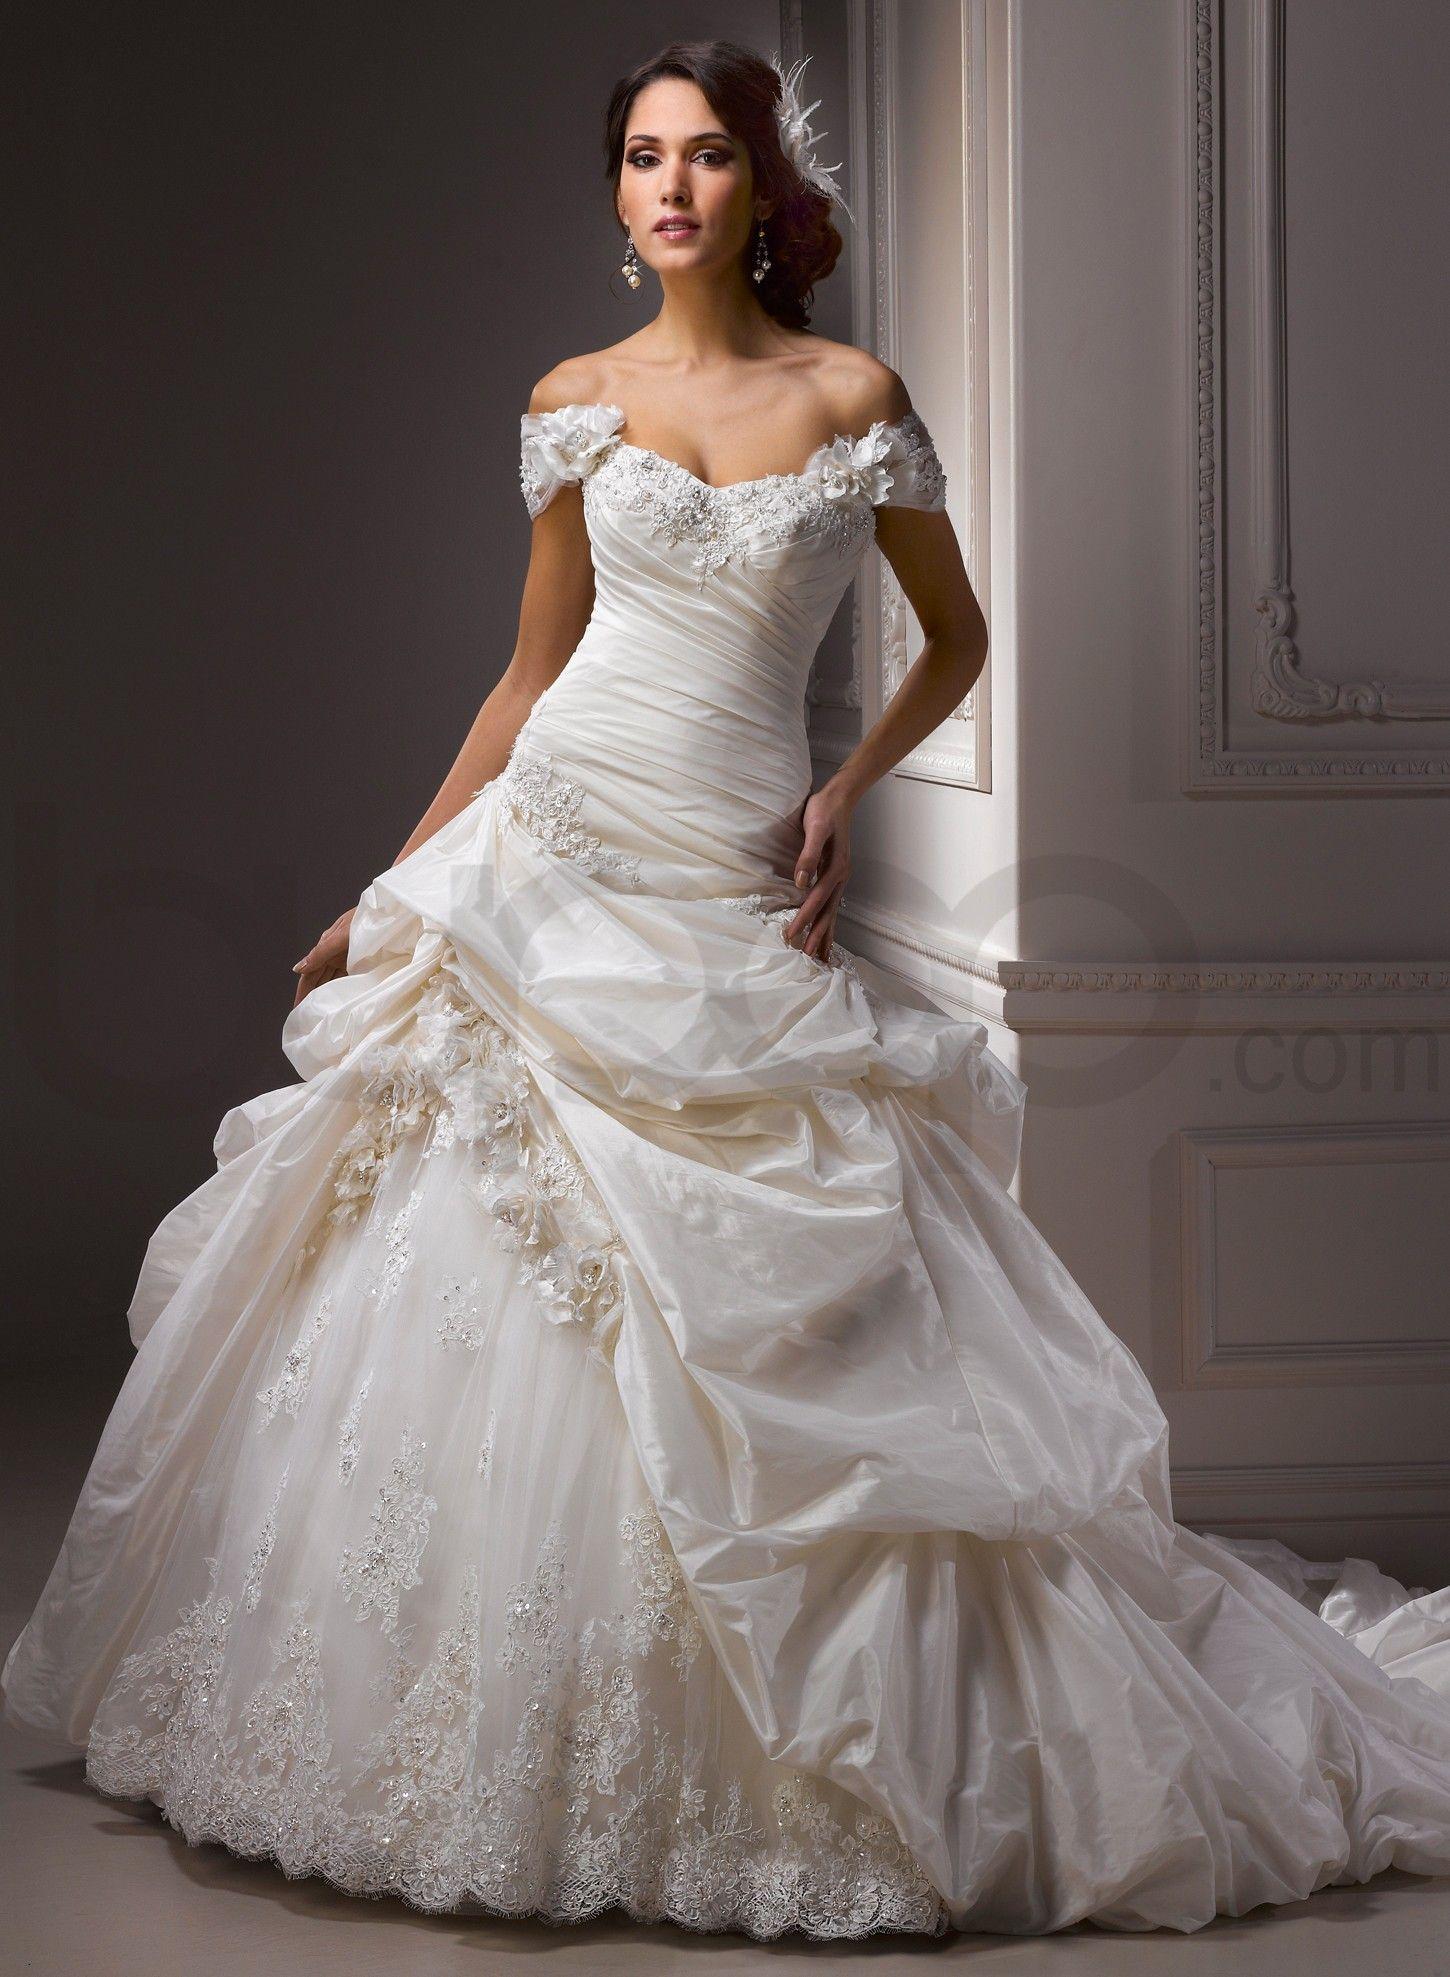 wedding dress cap sleeves Bordeaux Metallic Taffeta Soft Shimmer Satin Detachable Cap sleeve Shoulder Sweetheart Neckline Ball Gown